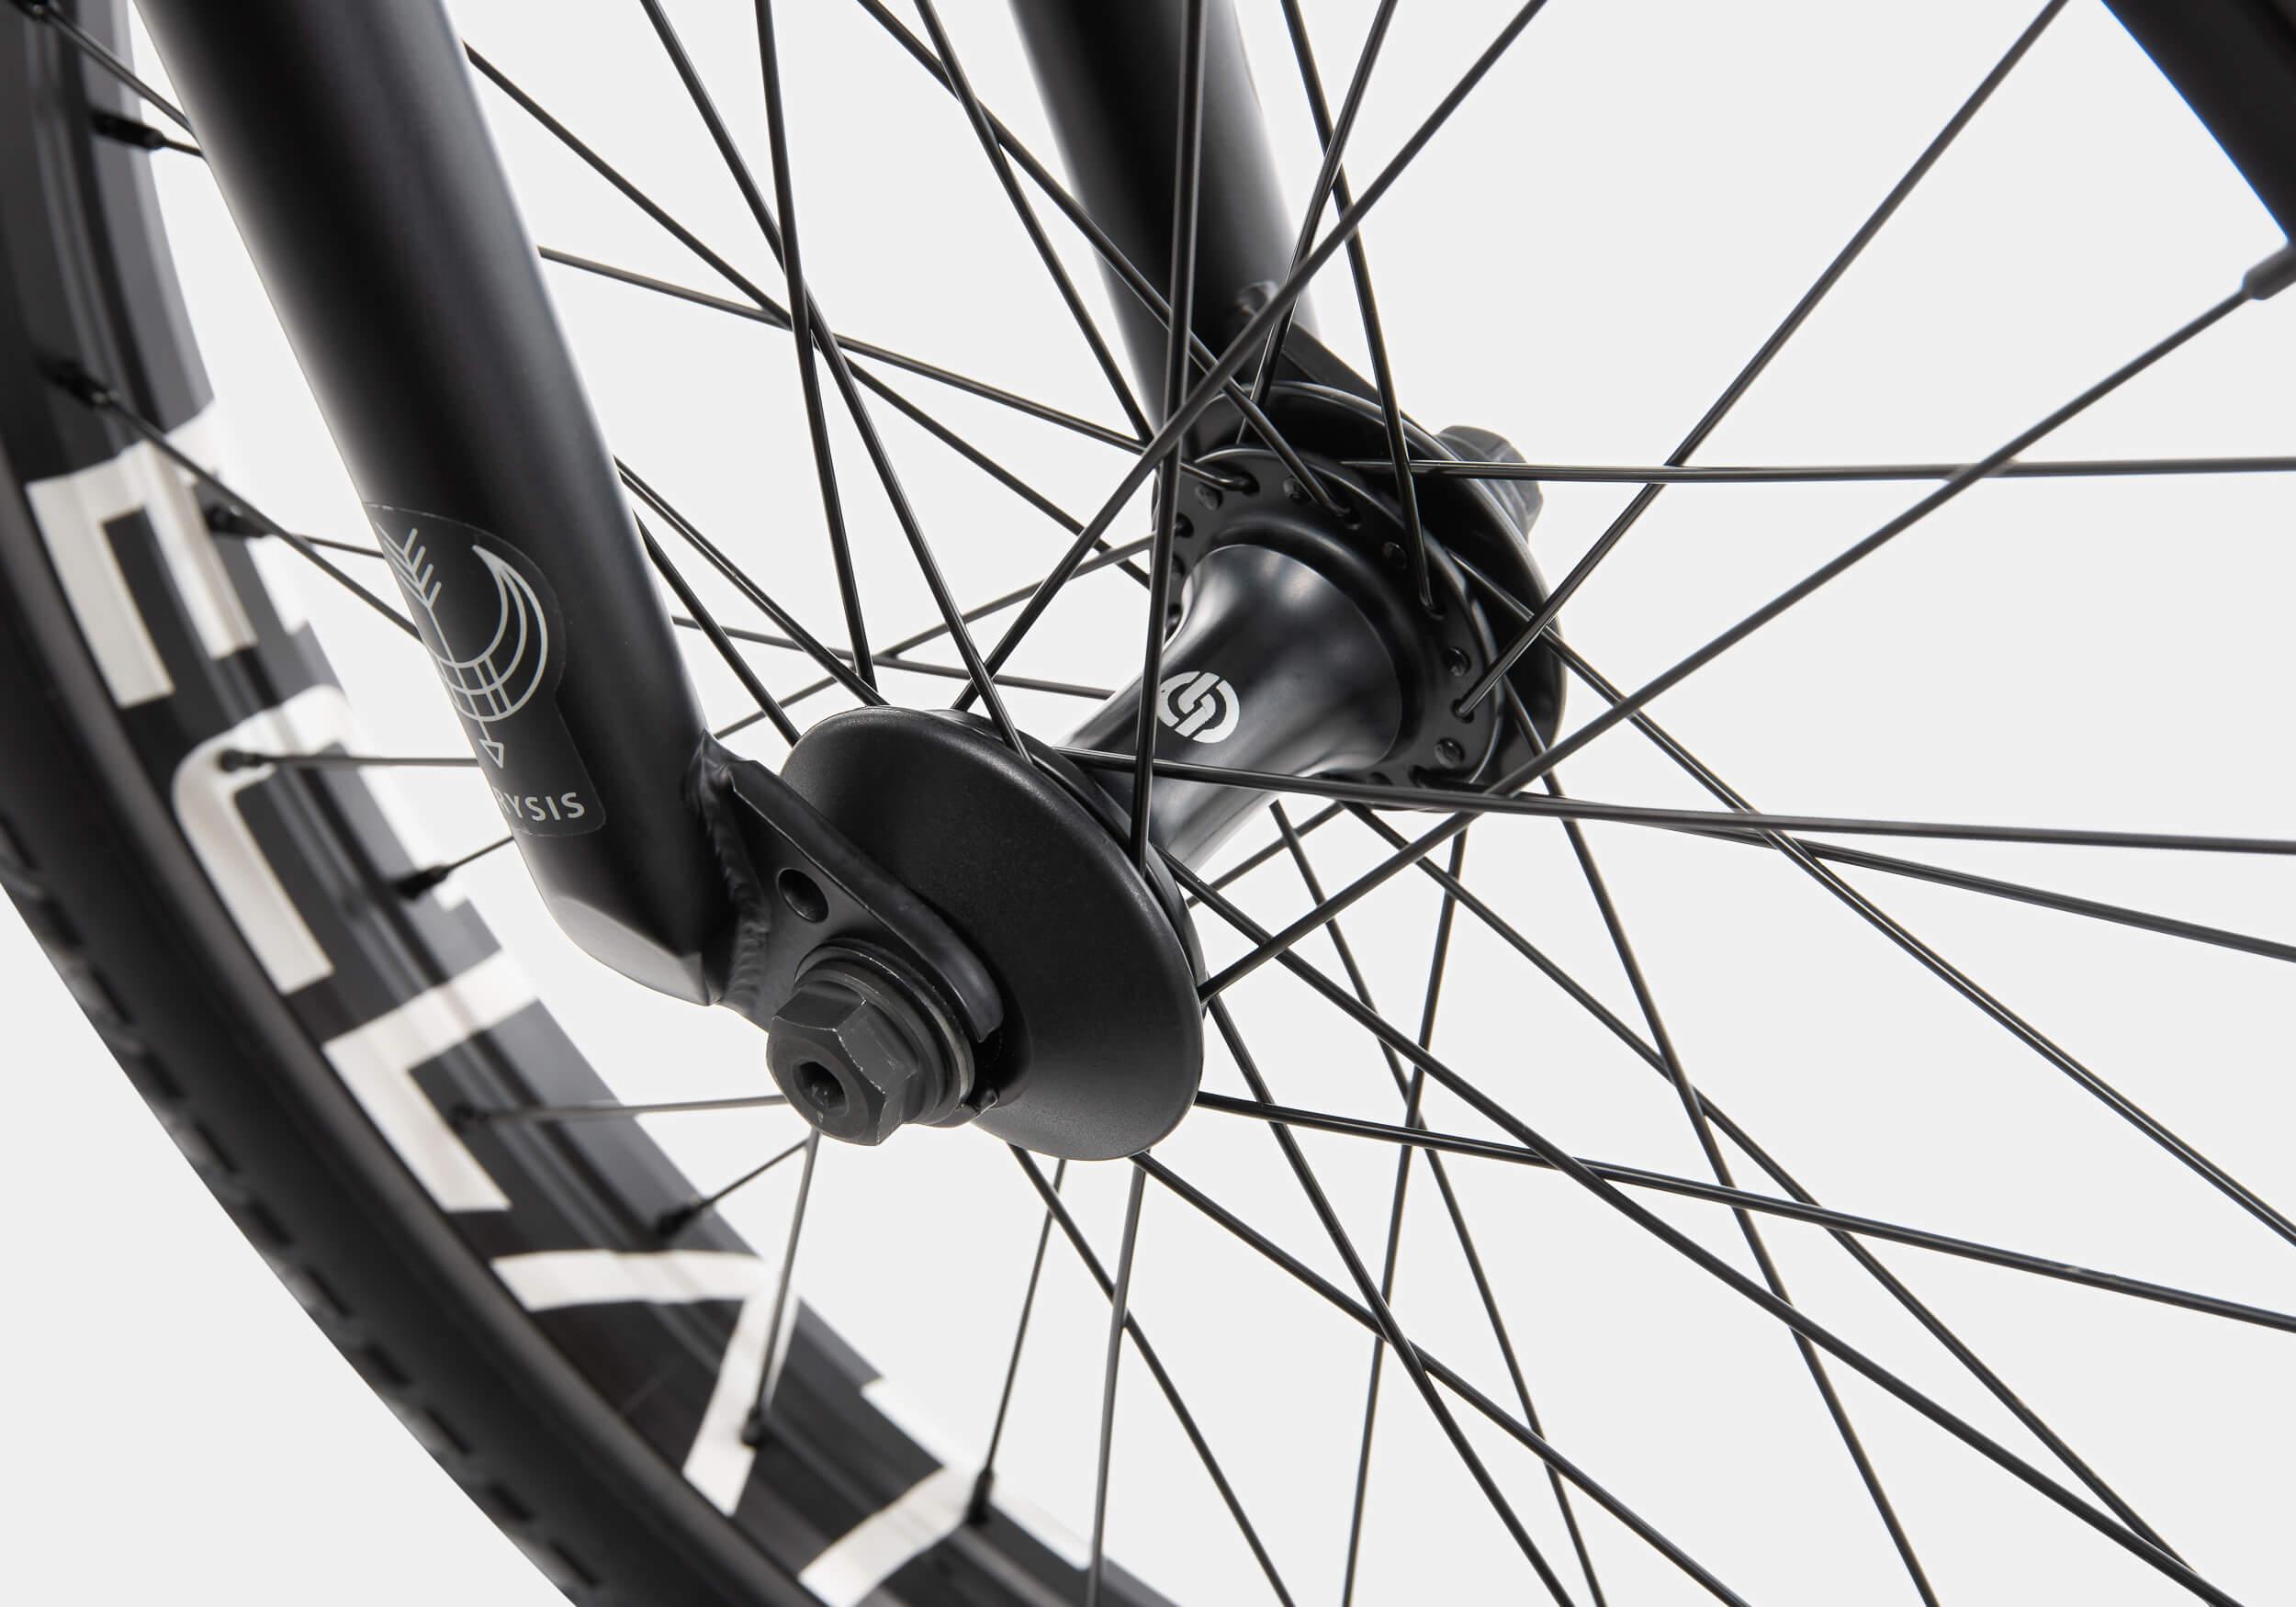 BMX WETHEPEOPLE CRYSIS TRANS OLIVE 2019